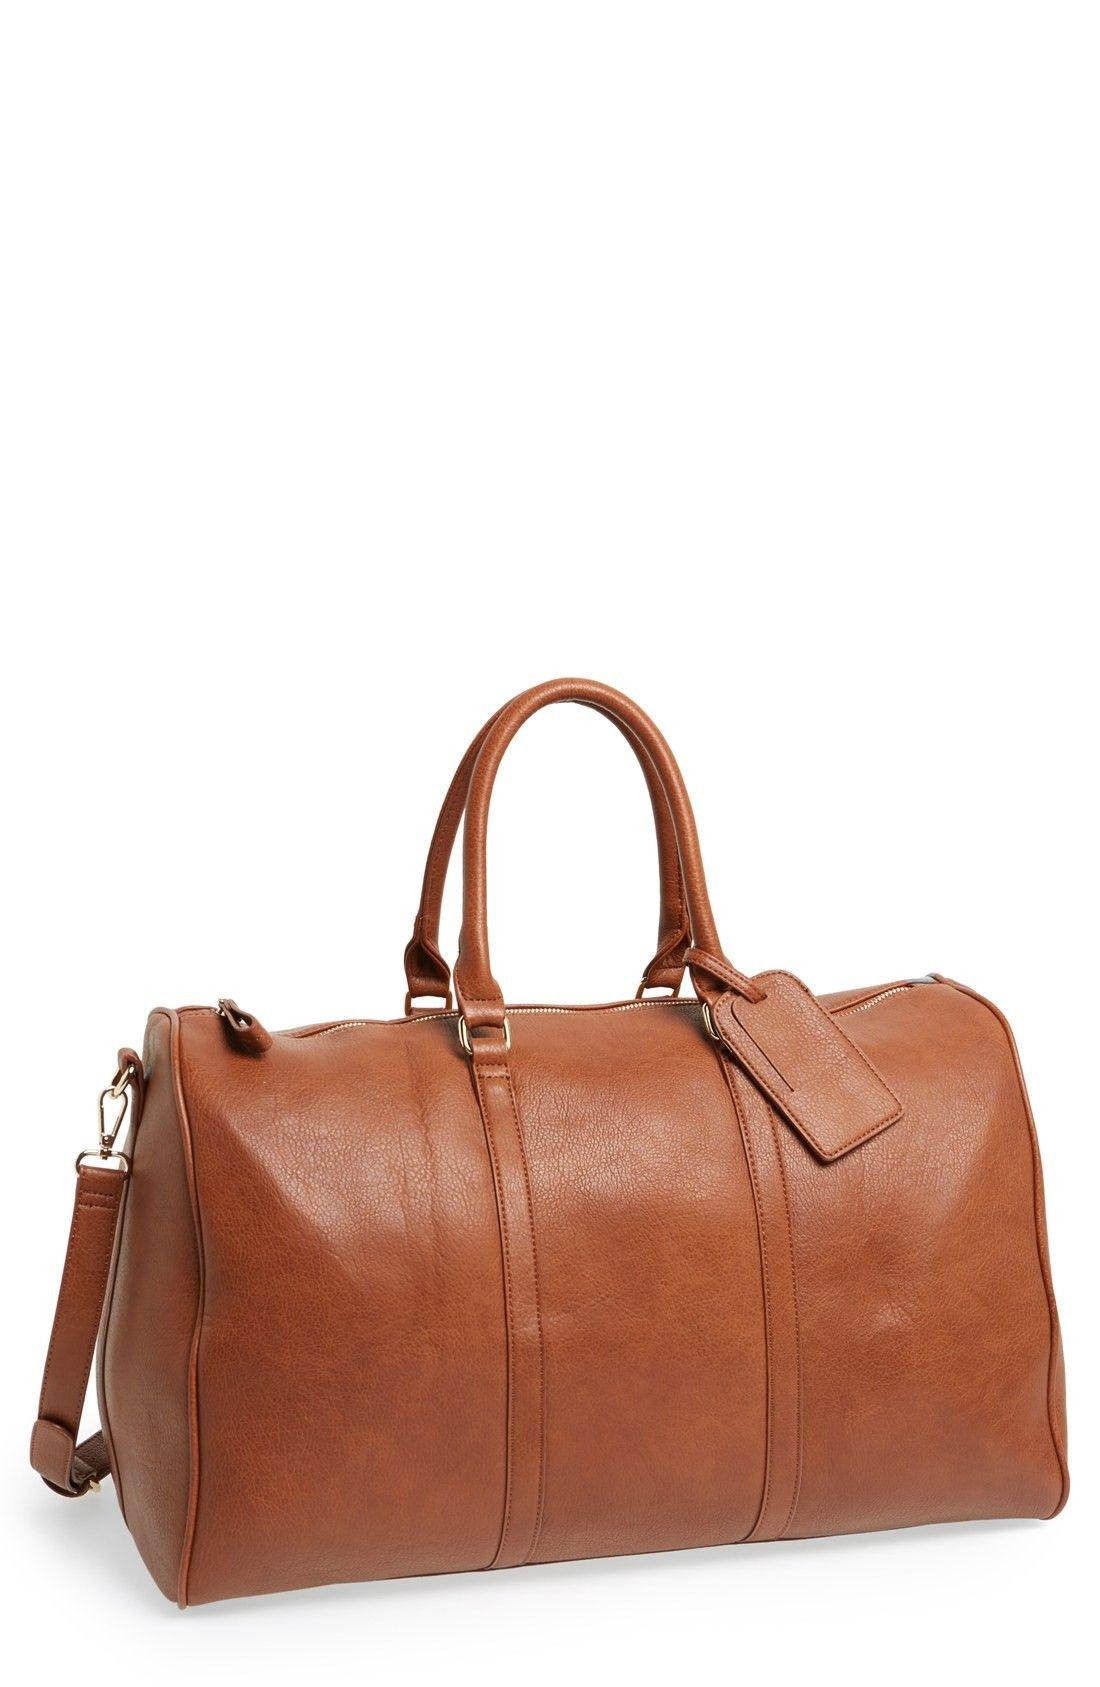 Lacie Faux Leather Duffel Bag 85 Leather Weekender Bag Leather Duffel Leather Duffle Bag